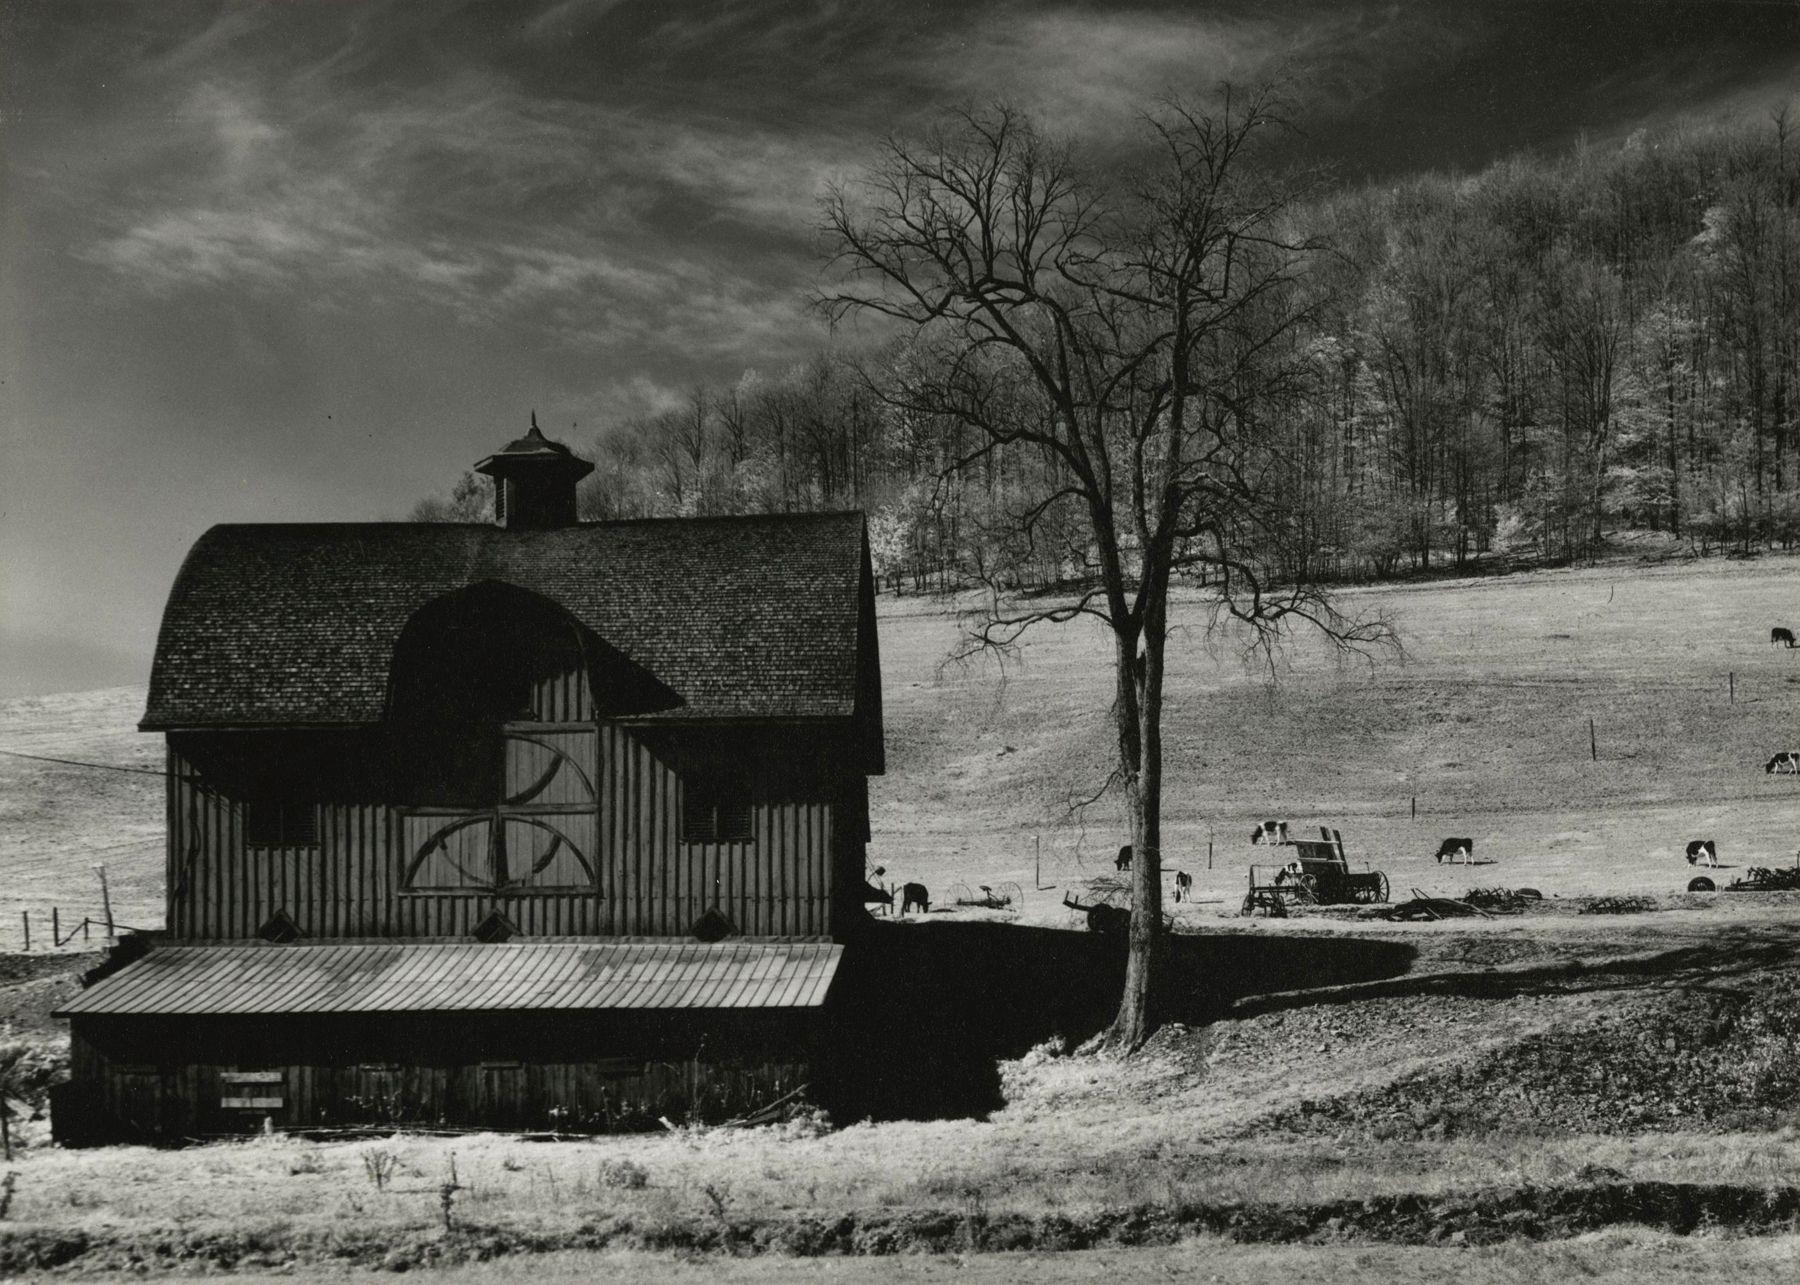 Minor White - Pennsylvania, 1955 - Howard Greenberg Gallery